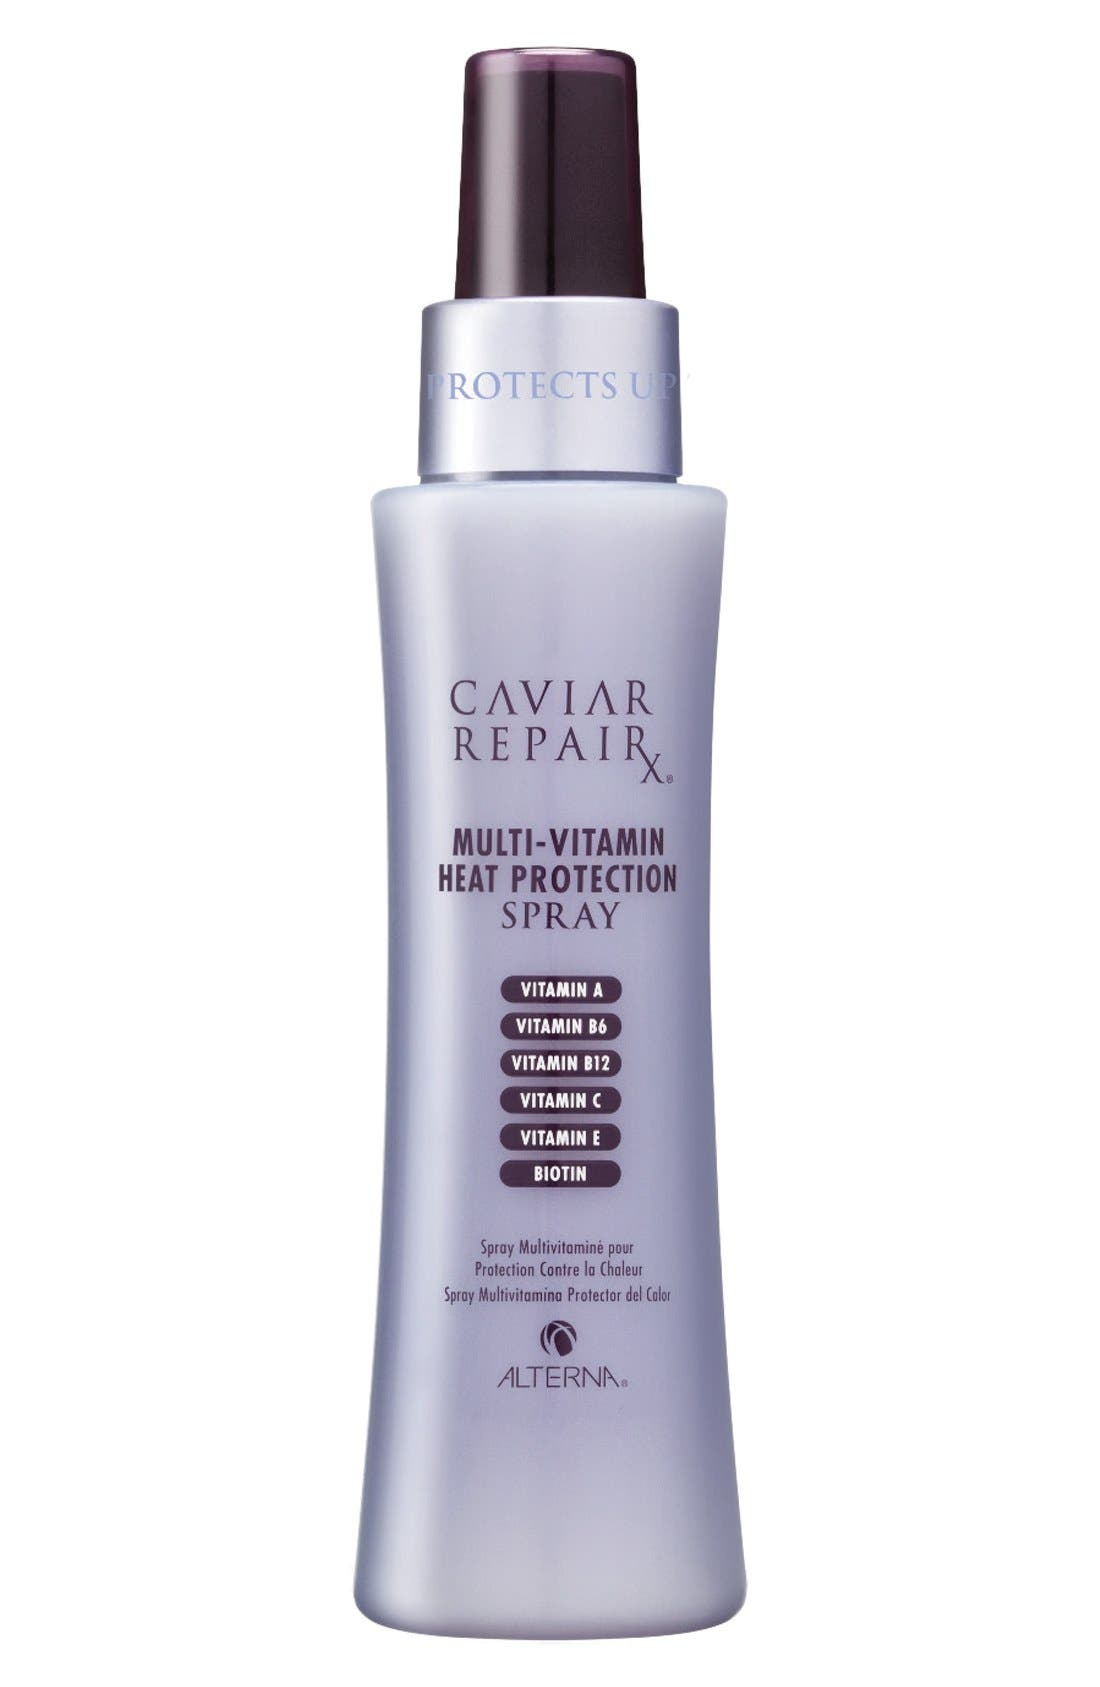 ALTERNA® Caviar Repair Rx Multi-Vitamin Heat Protection Spray